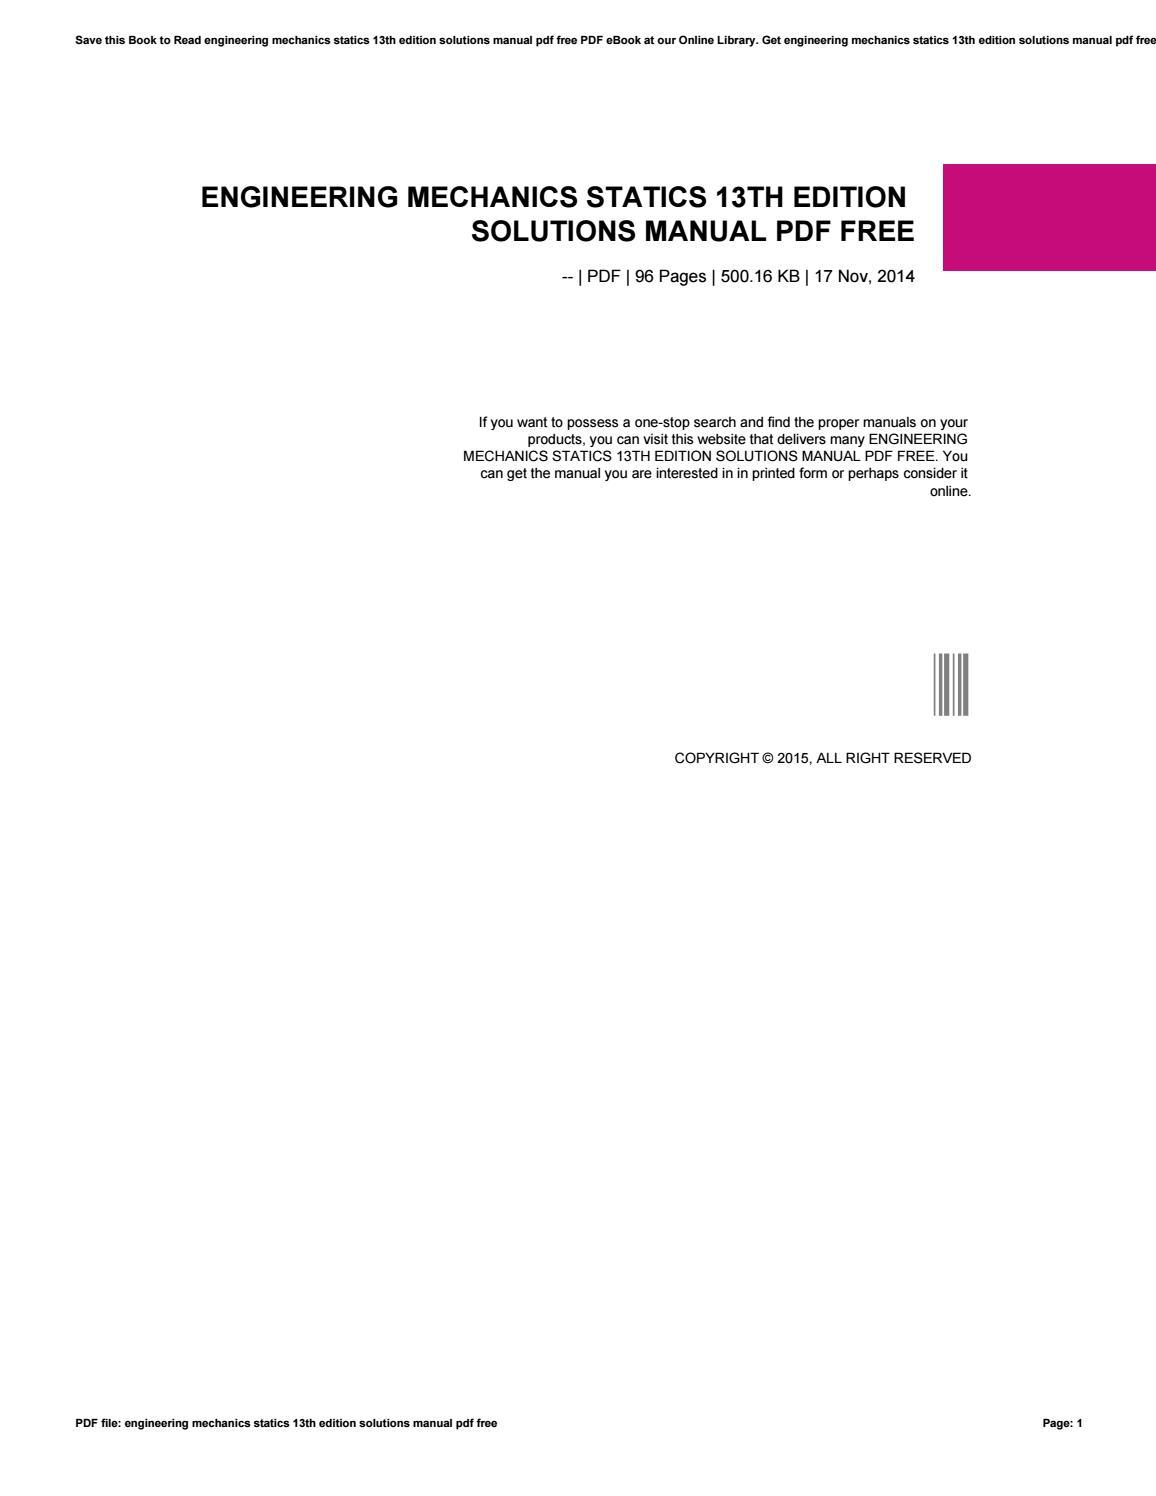 Engineering mechanics statics 13th edition solutions manual pdf free by  andreas7yuana - issuu